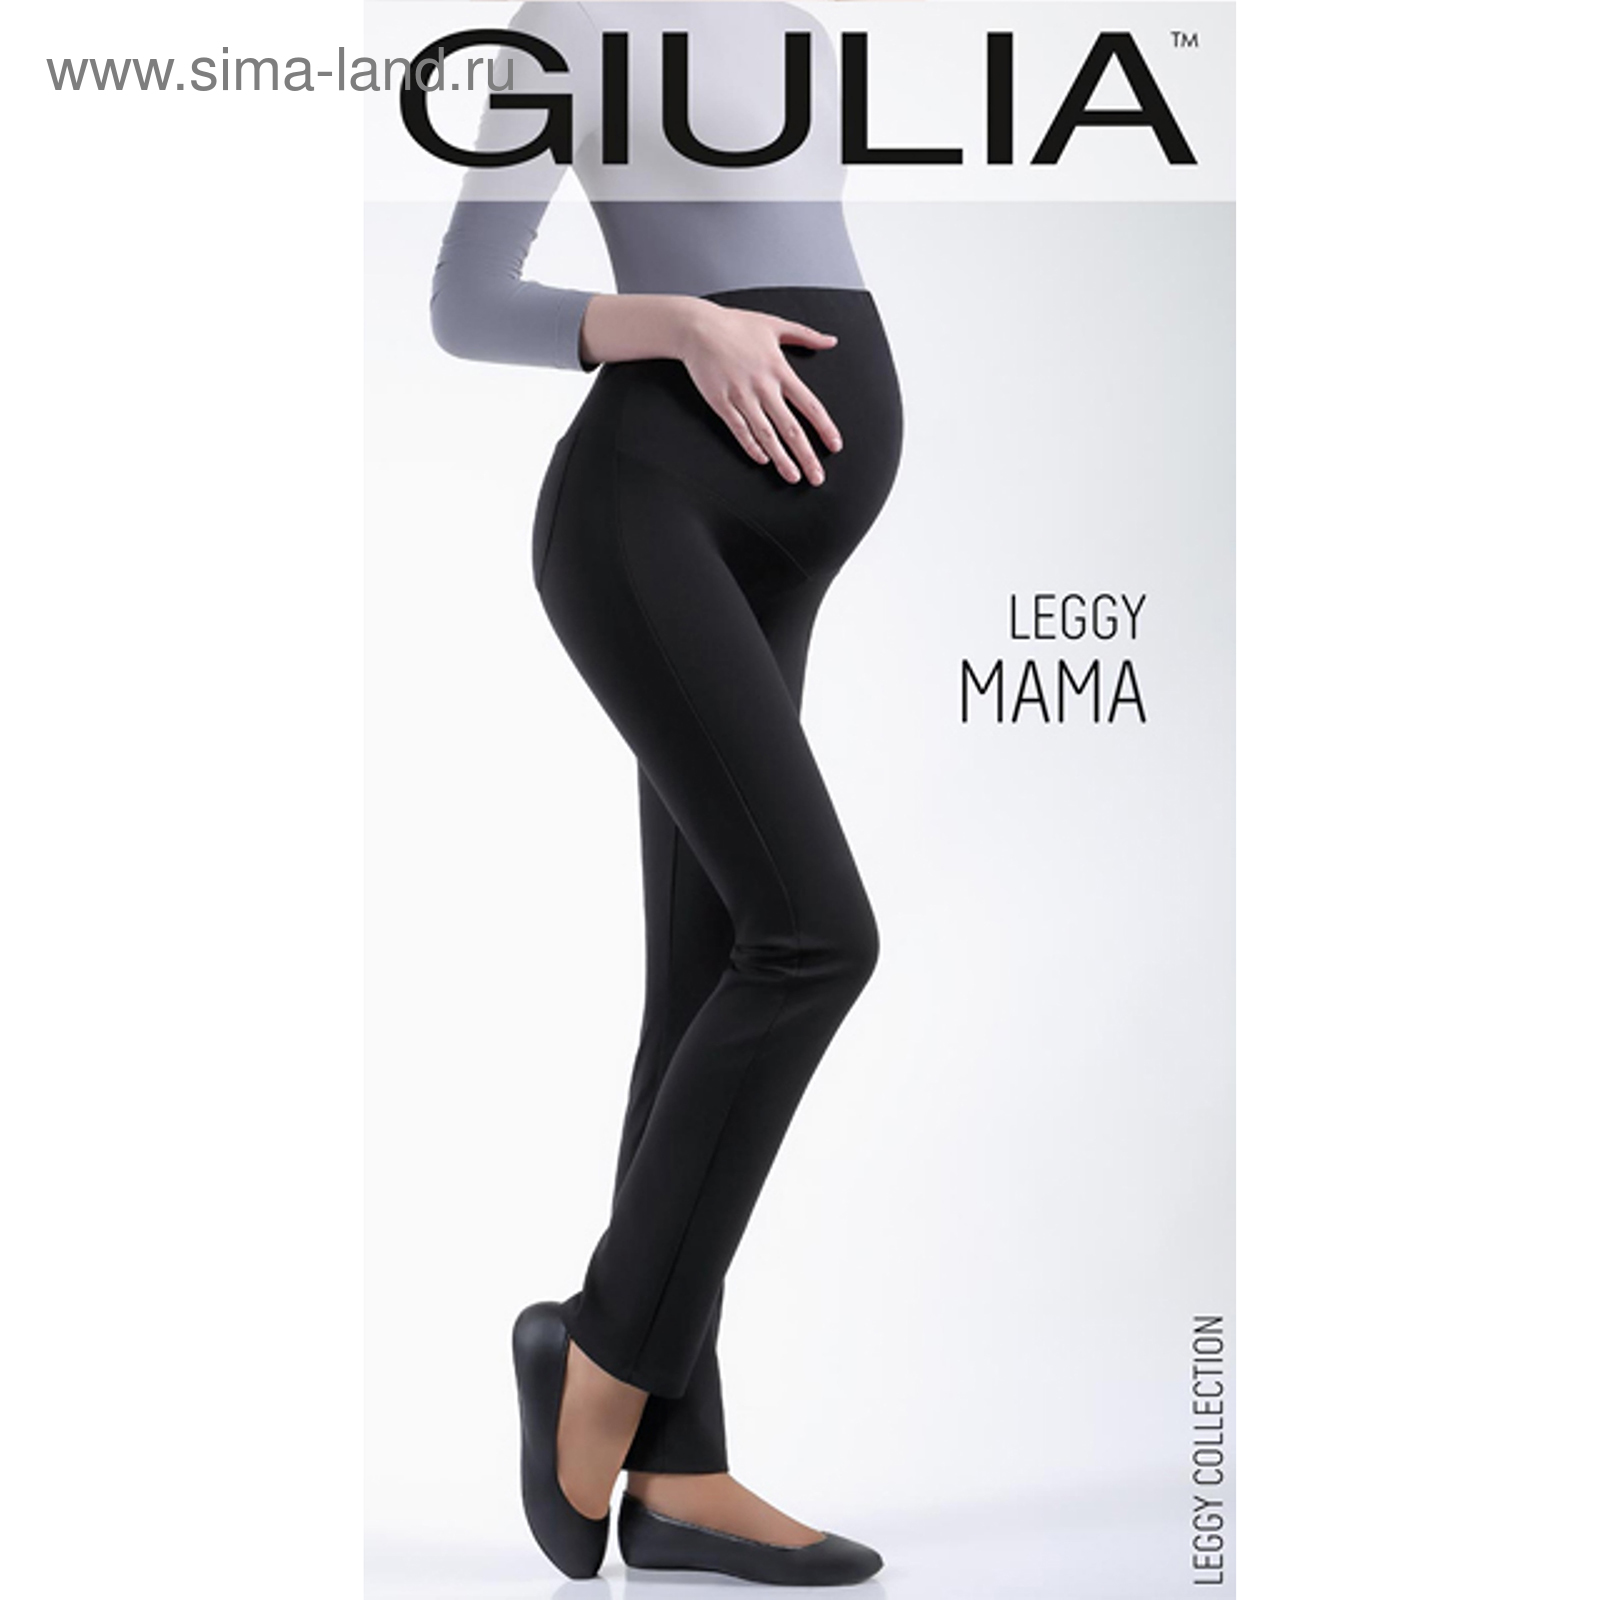 Леггинсы для беременных LEGGY MAMA 01 цвет nero, размер L (617753 ... 333d5309253